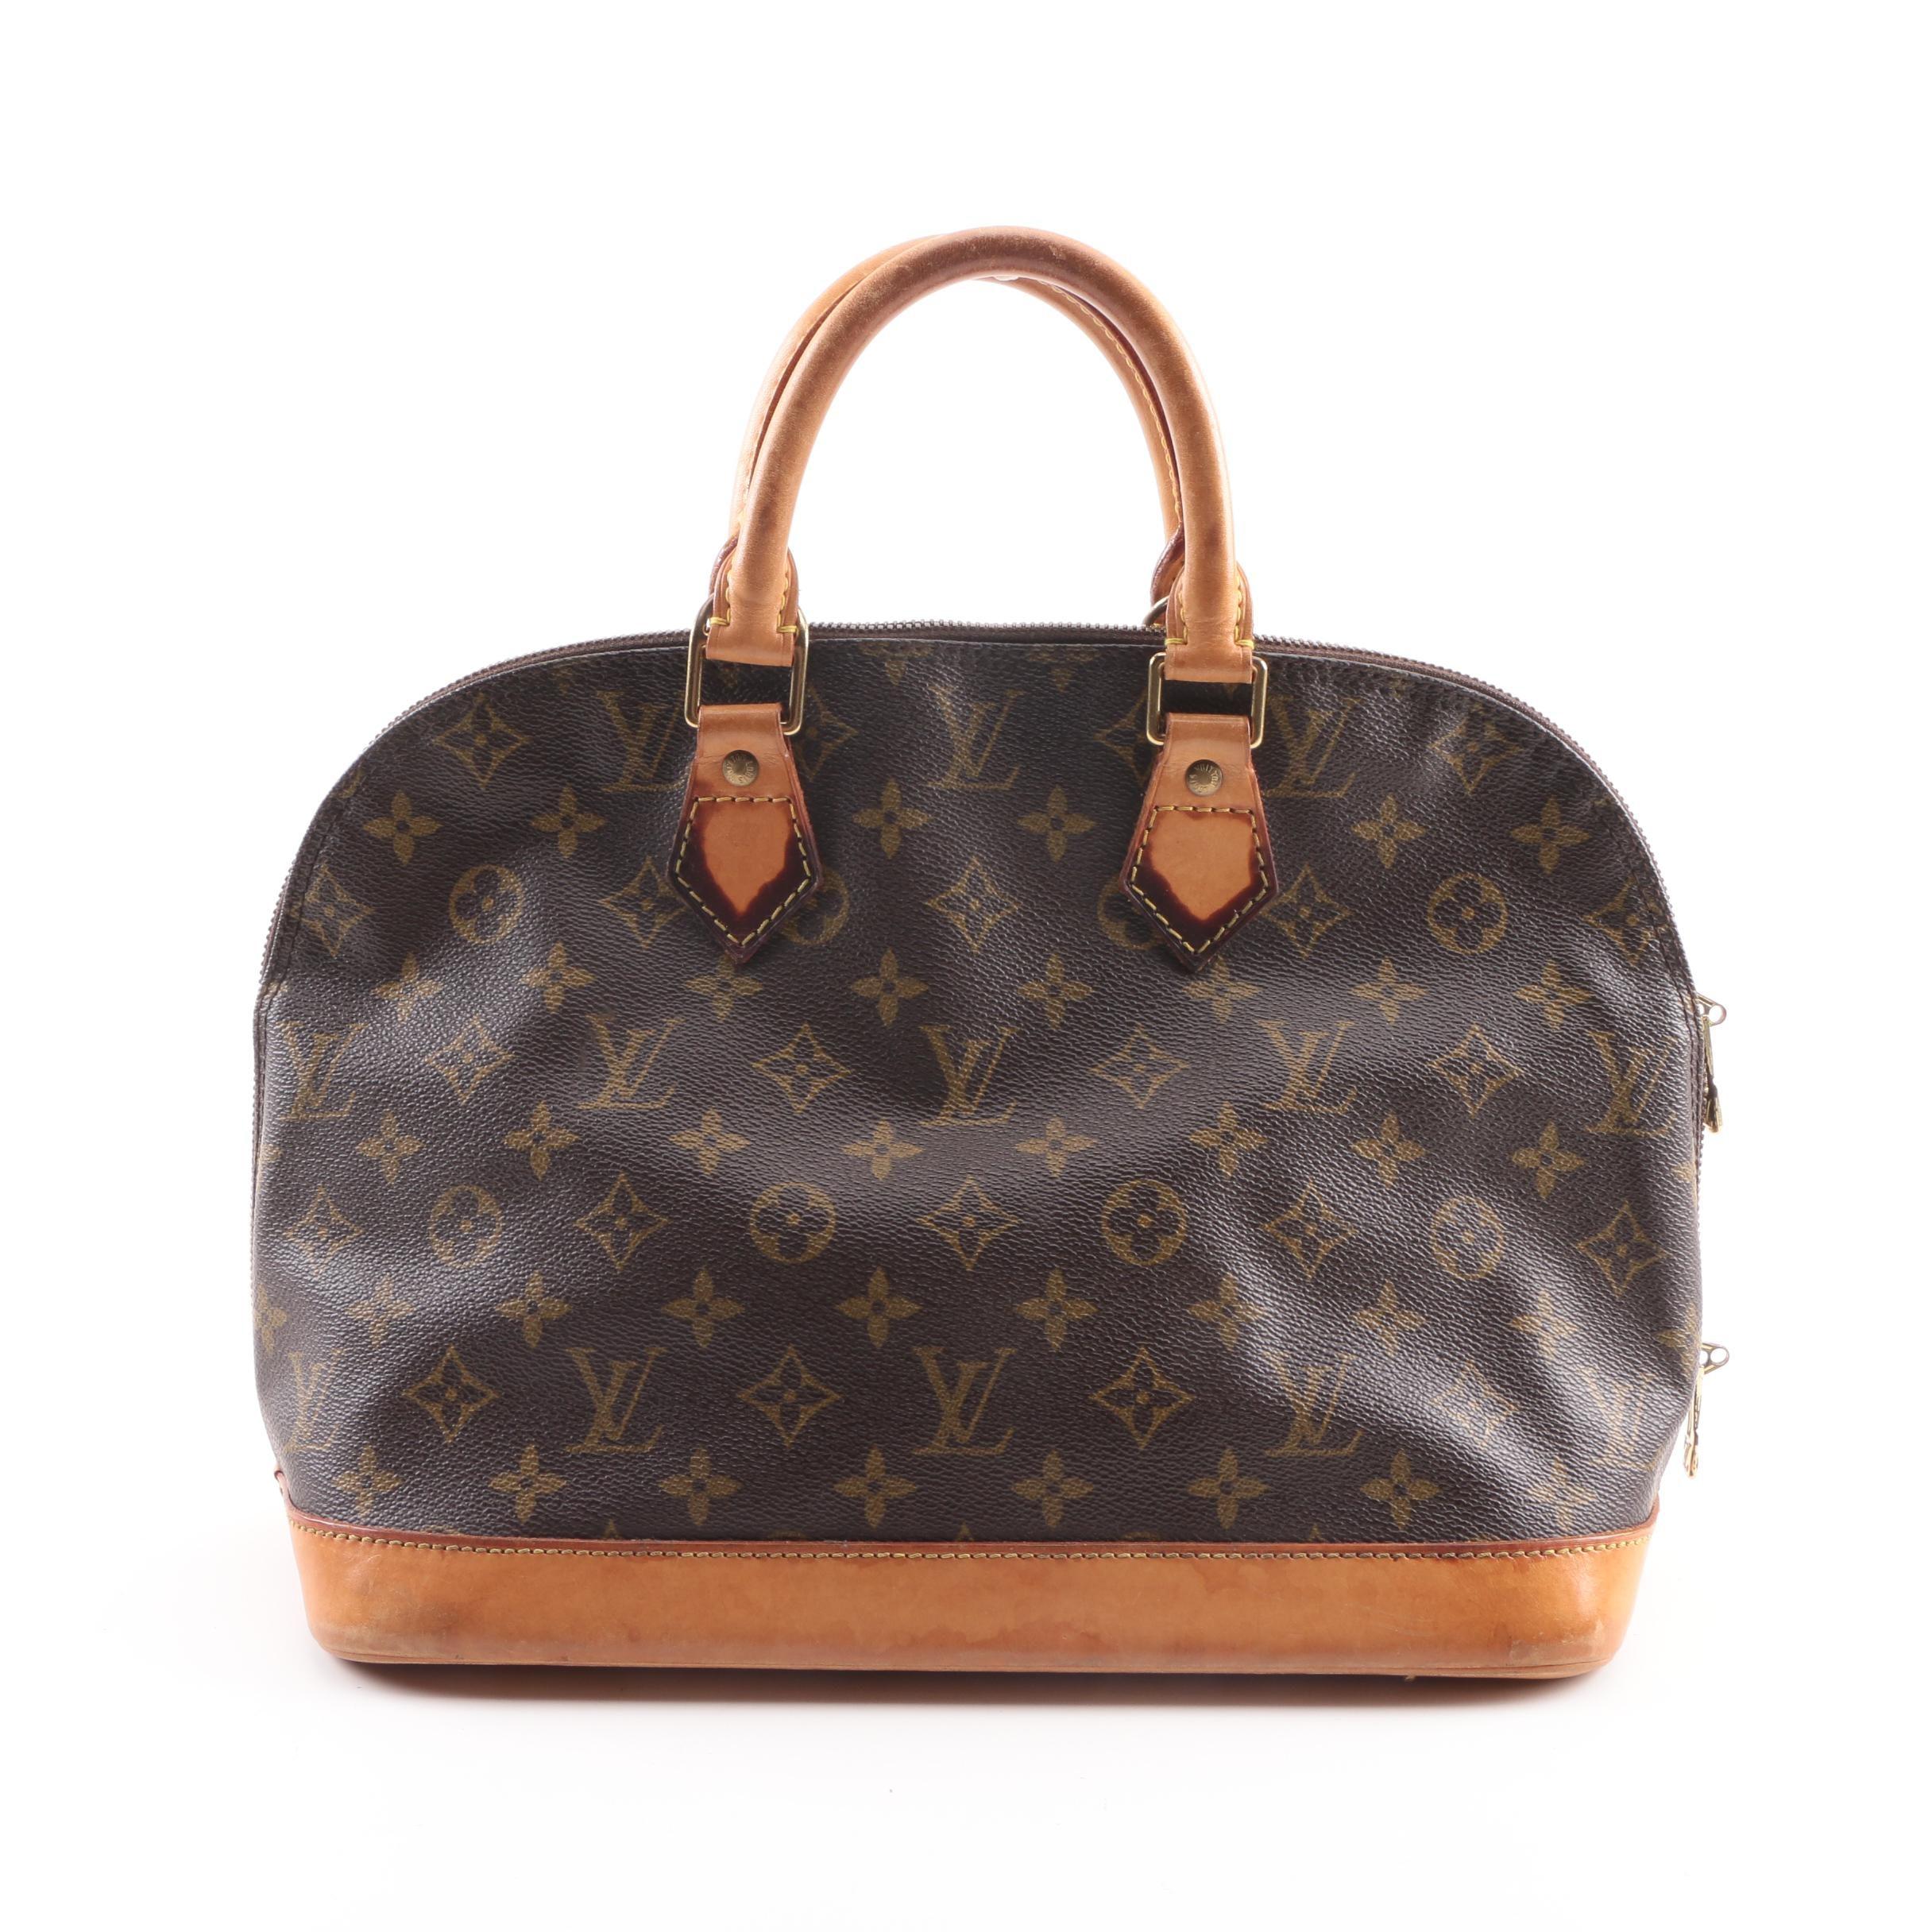 1996 Louis Vuitton Paris Alma PM Monogram Canvas Handbag